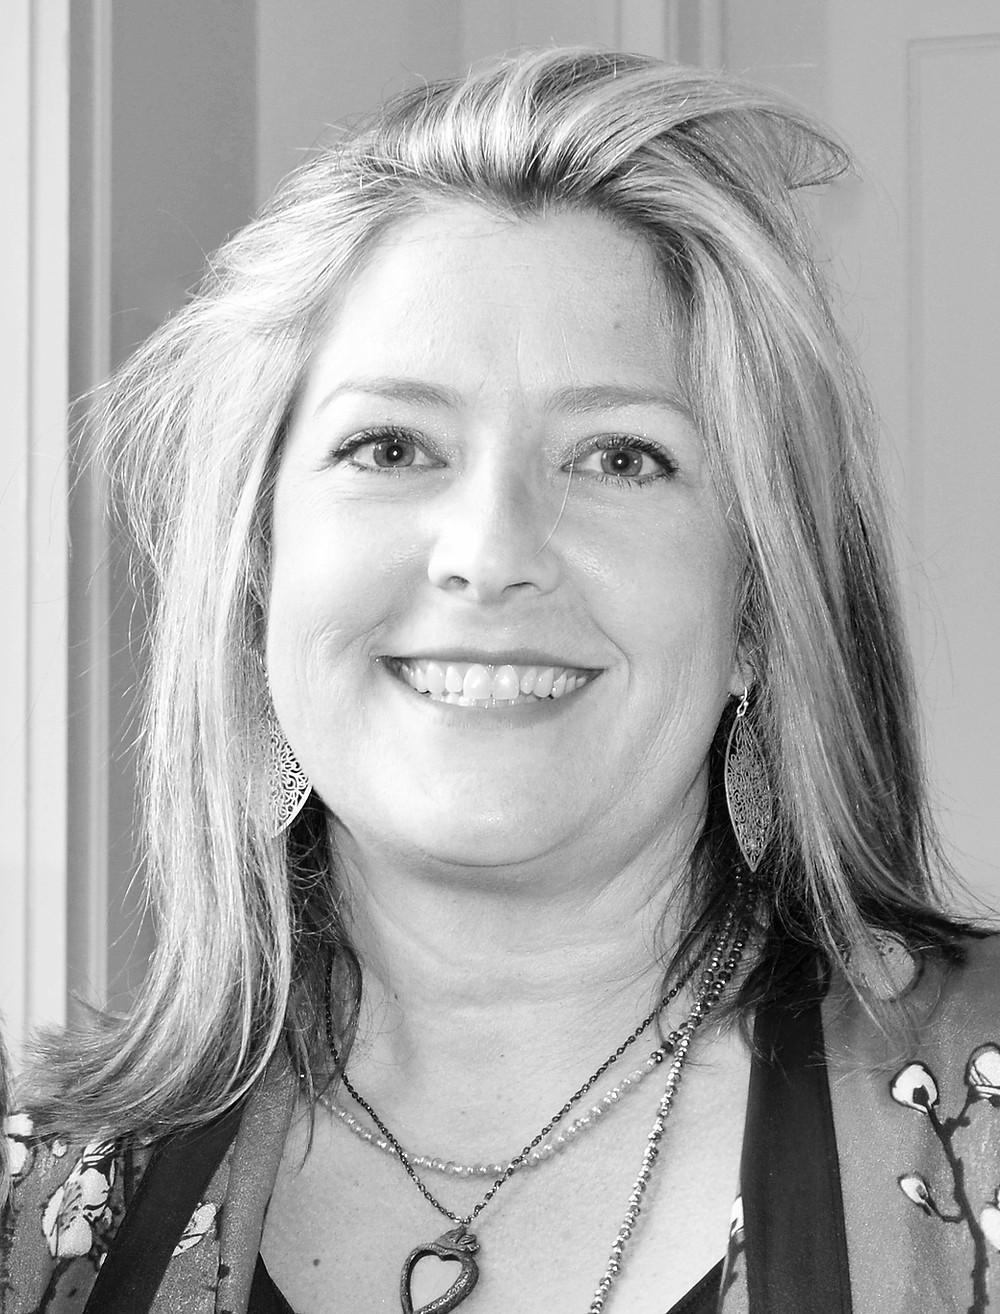 Alison Pelegrin